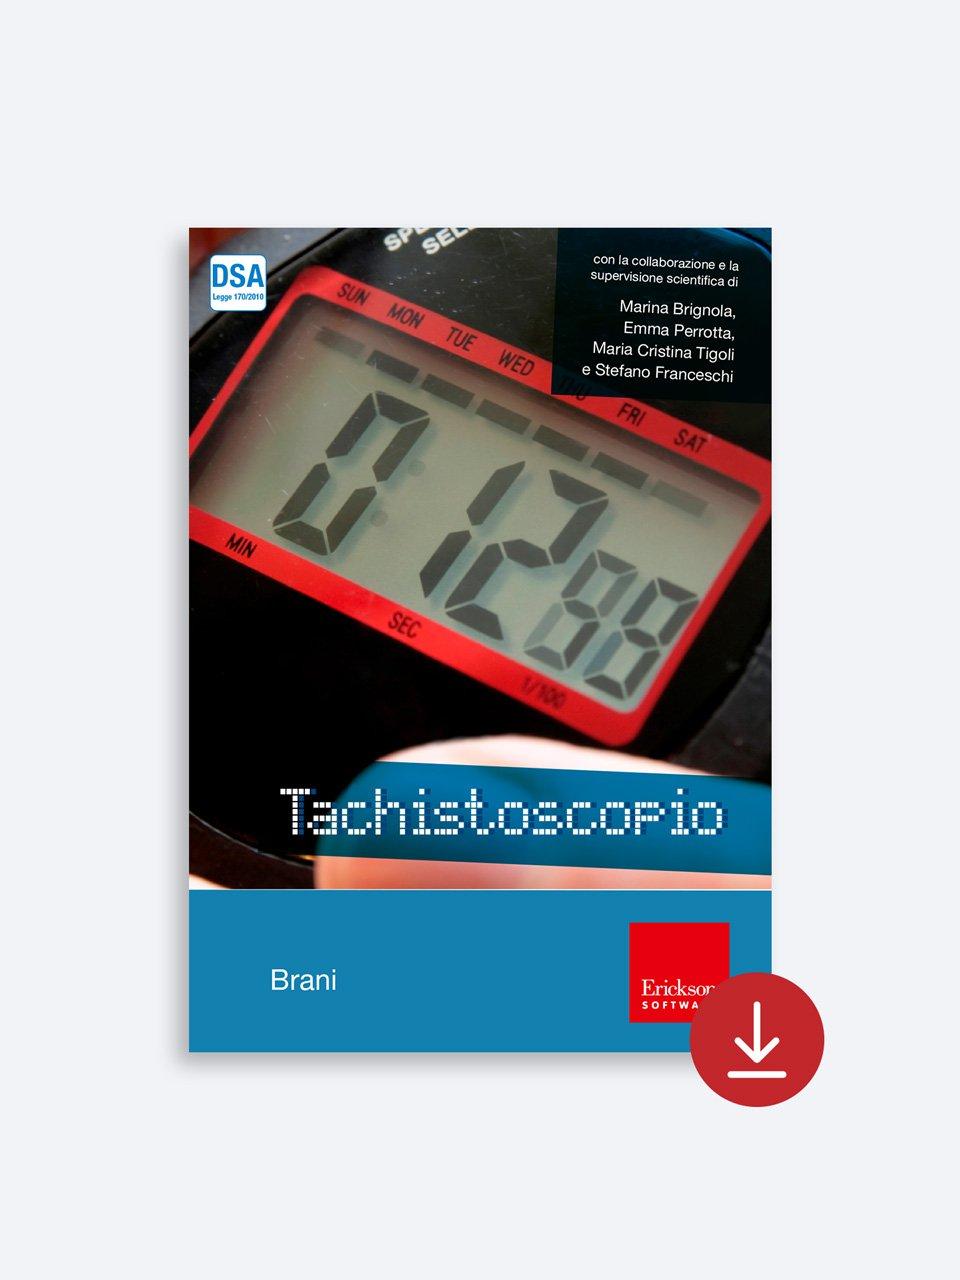 Tachistoscopio SUITE - App e software - Erickson 6